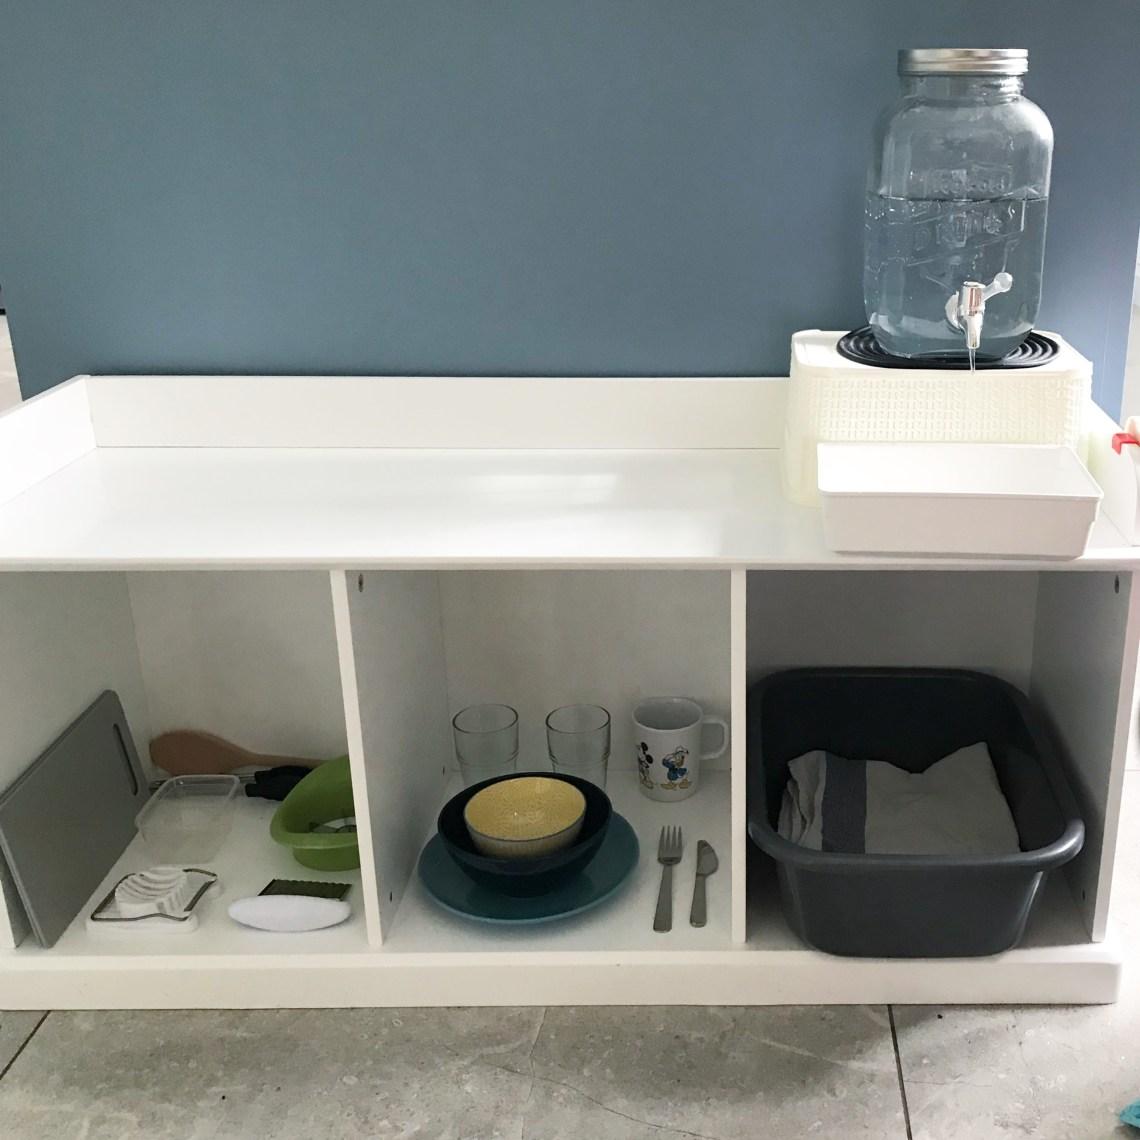 Montessori Toddler Kitchen - The Prepared Environment